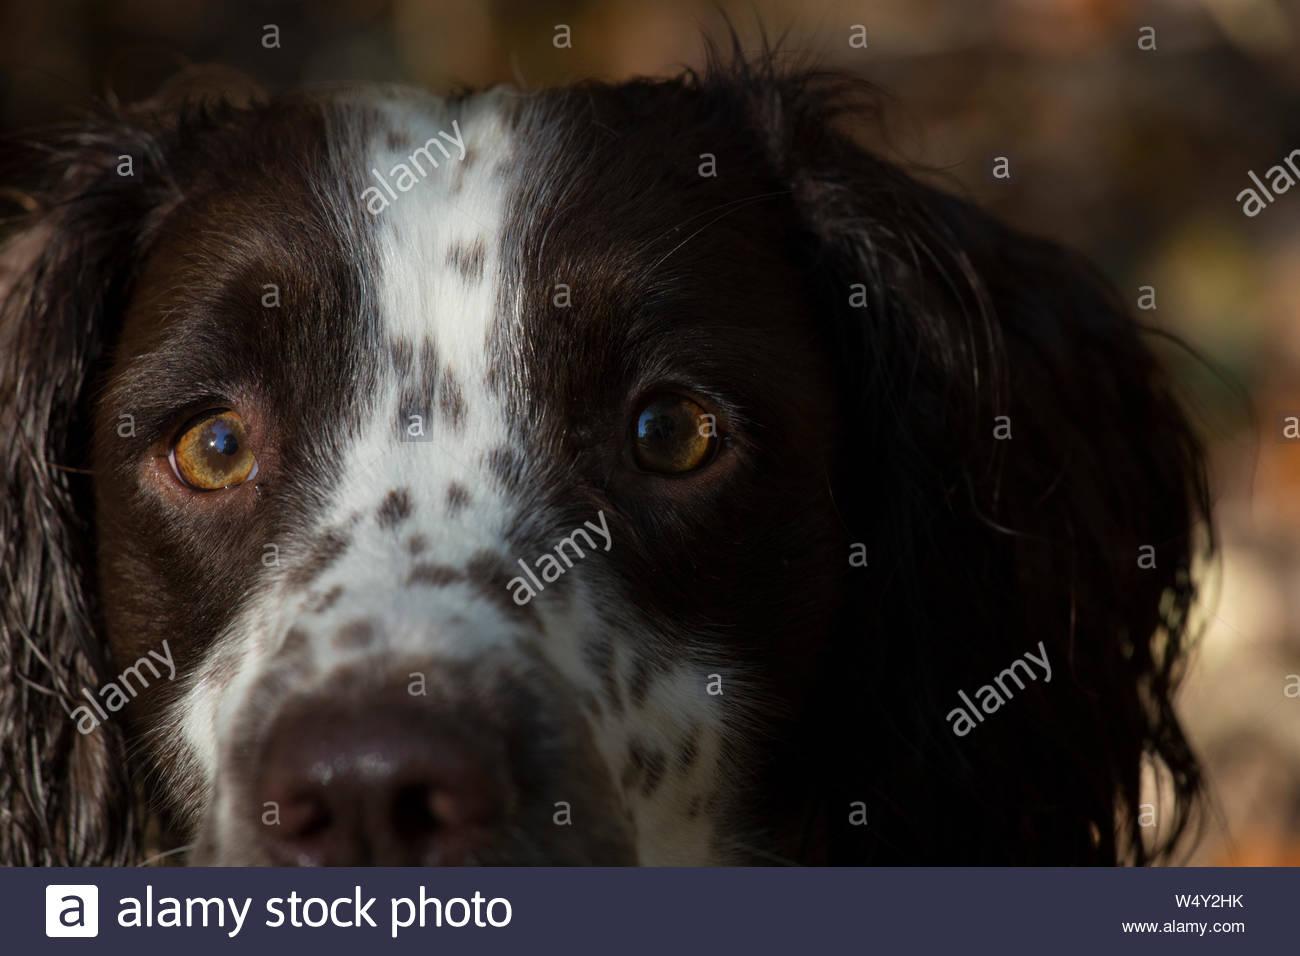 Dog Eyes Contact Stock Photos & Dog Eyes Contact Stock